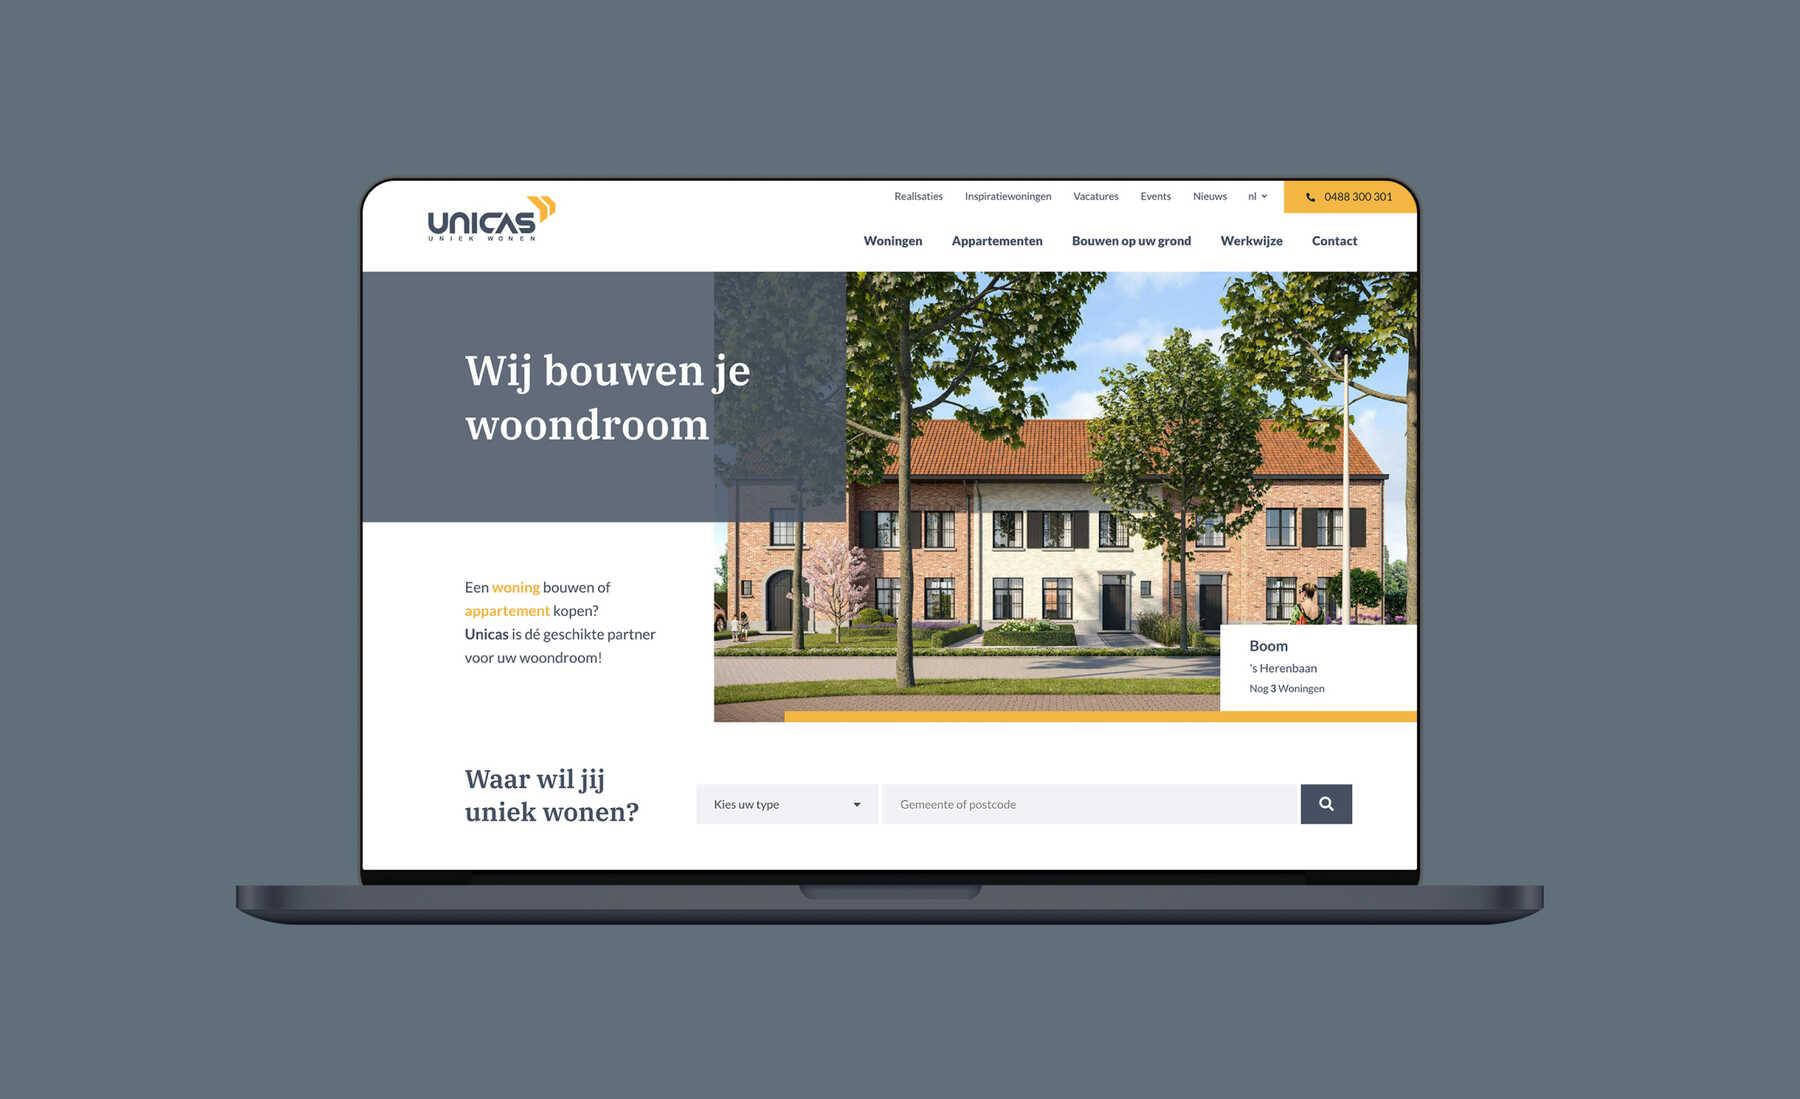 unicas site design